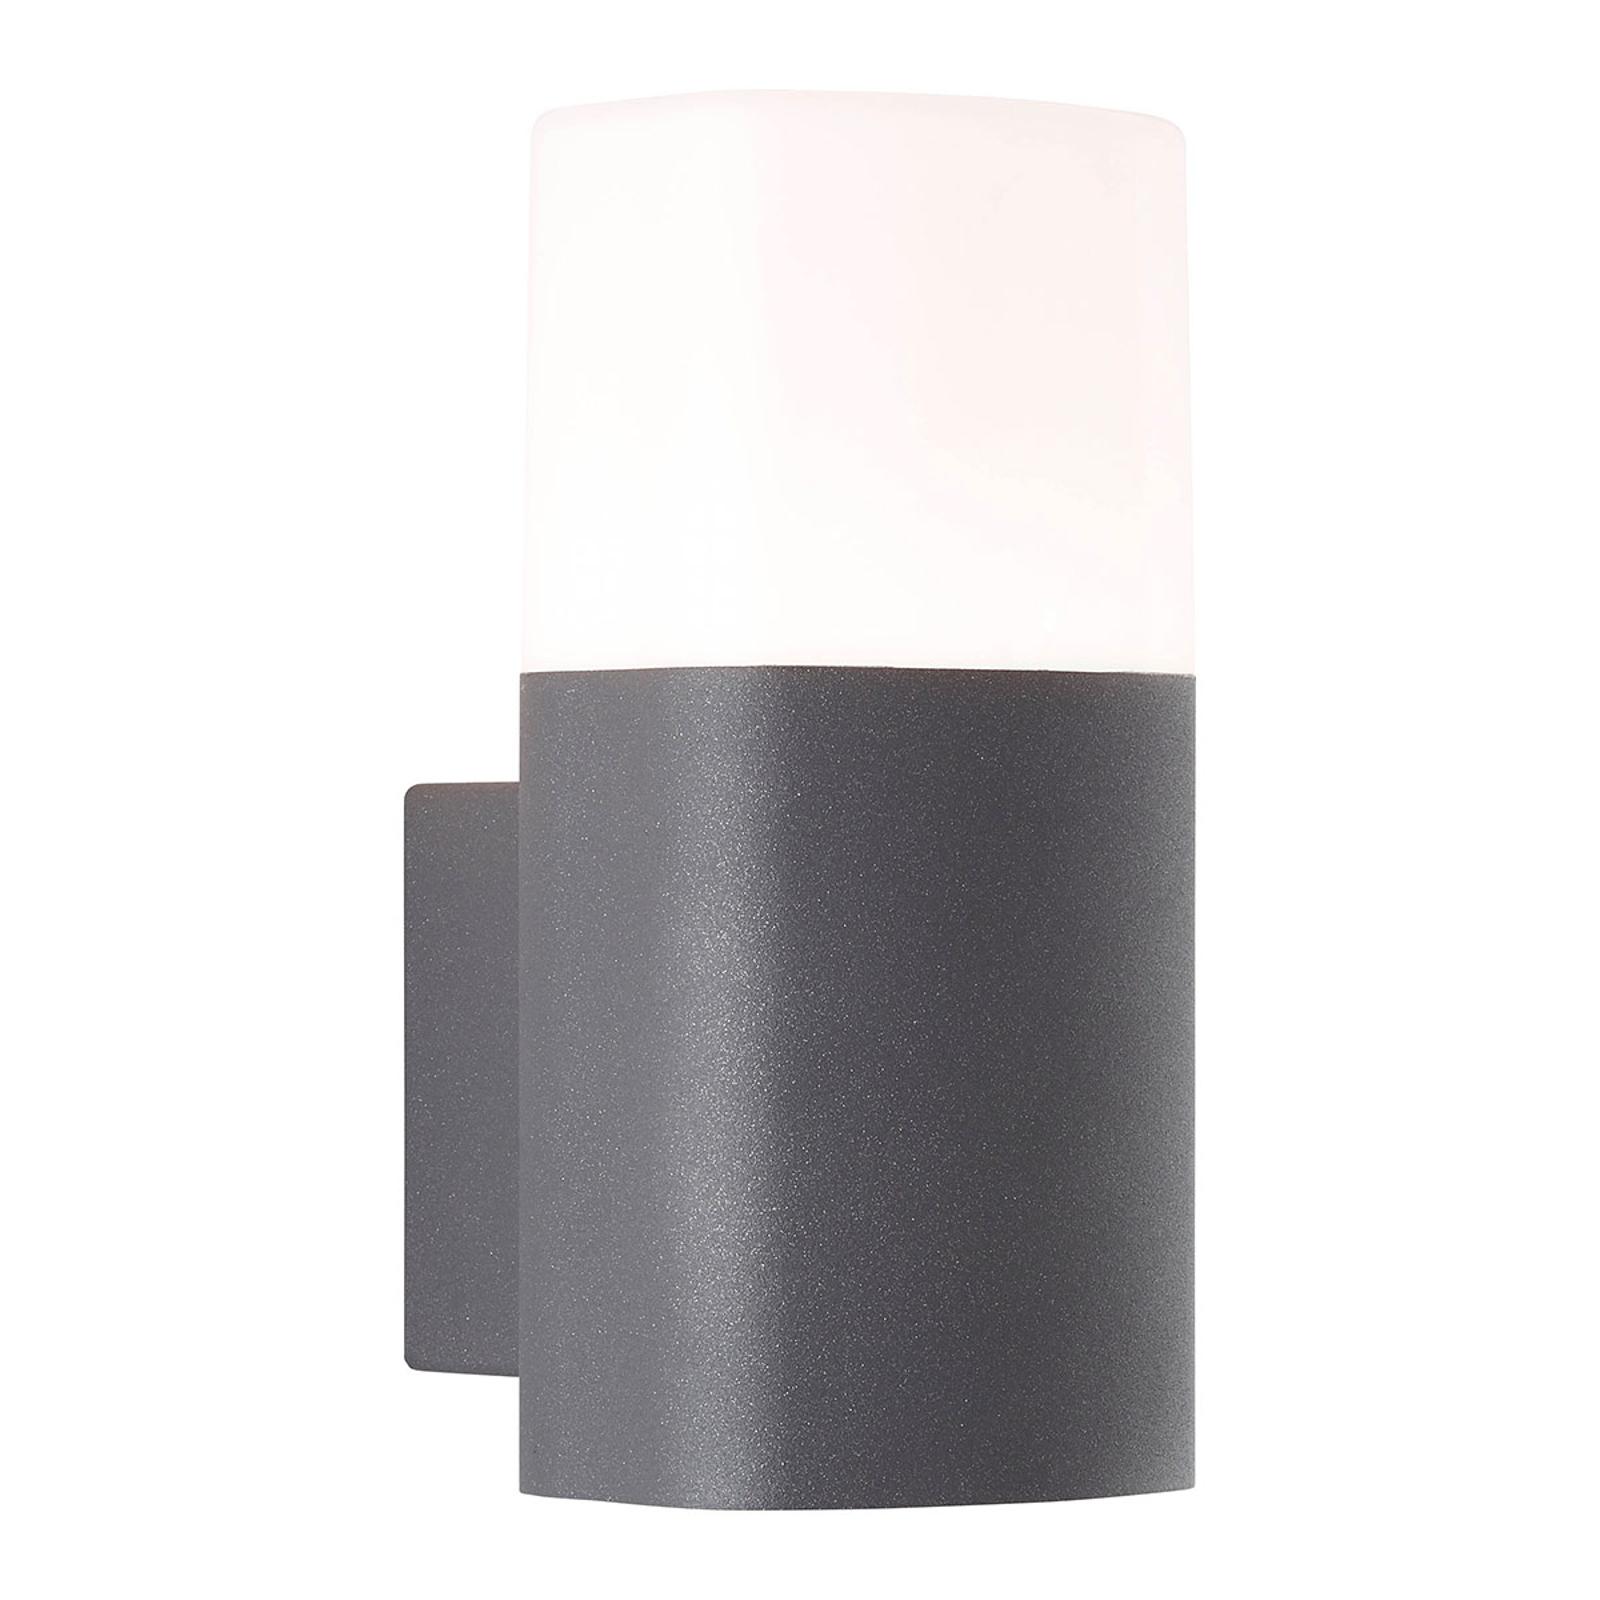 AEG Farlay LED-Außenwandleuchte einflammig